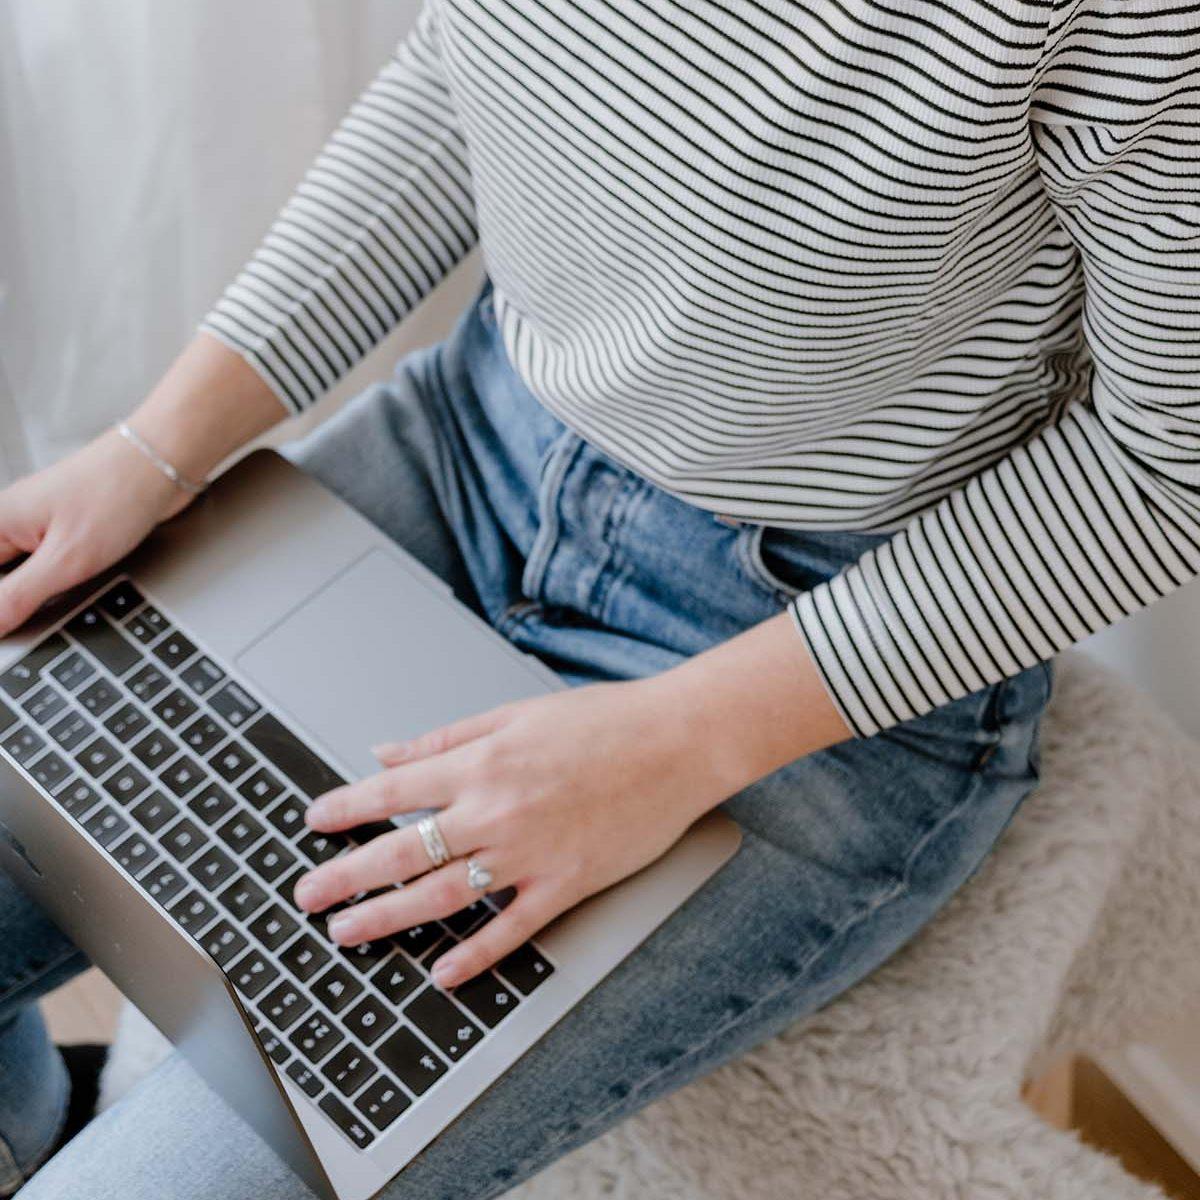 WordPress website | Webshop | Webdesign | Website Design | Eunoia Studio